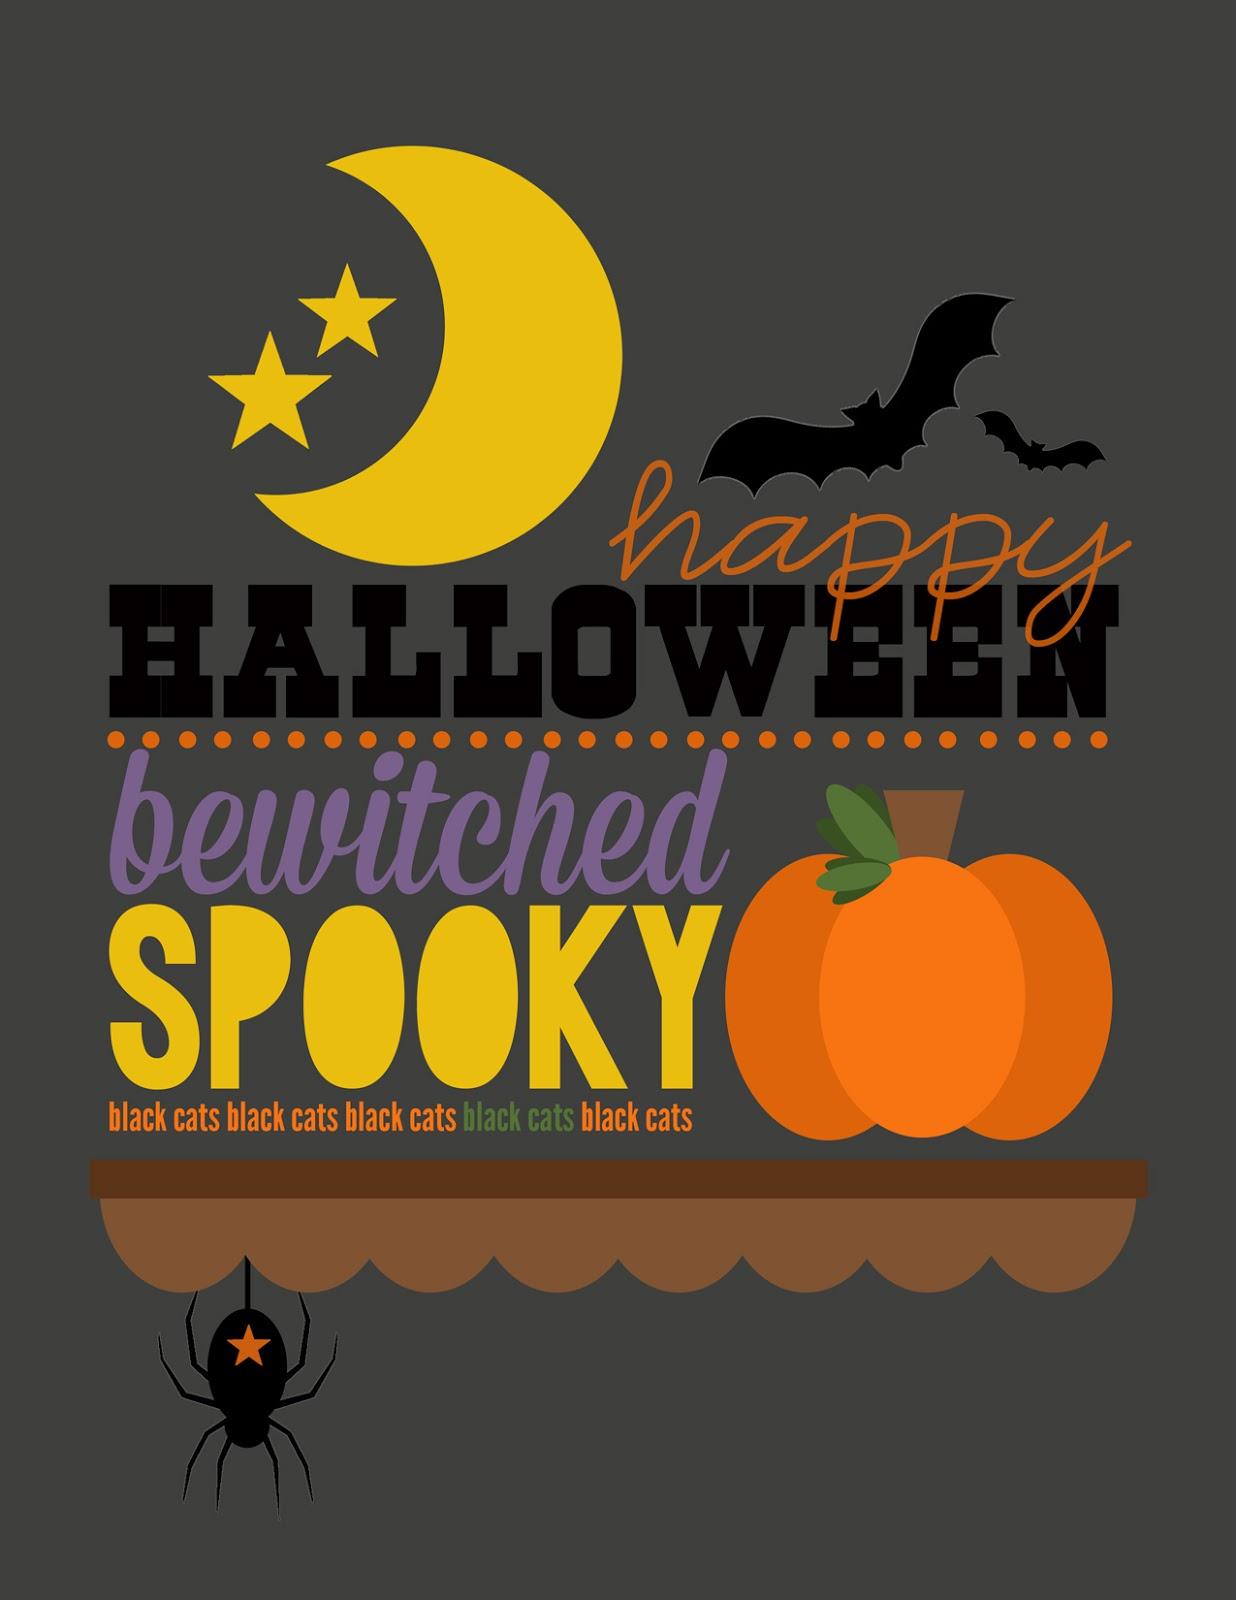 http://1.bp.blogspot.com/-6njSoz8jukA/VCMXwcPx4VI/AAAAAAAATKc/5704EbTXYEw/s1600/Halloween-Printable.jpg